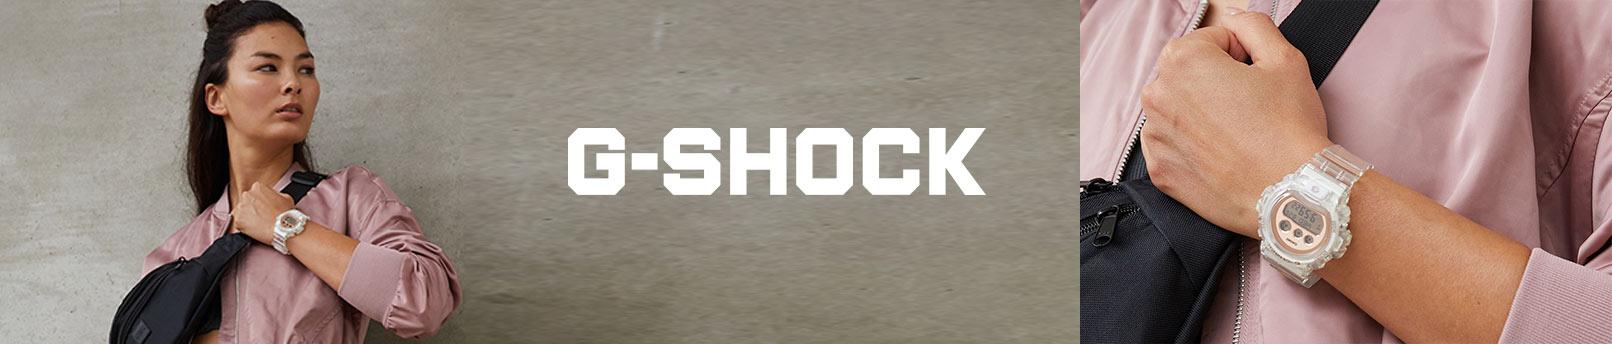 Shop G-SHOCK